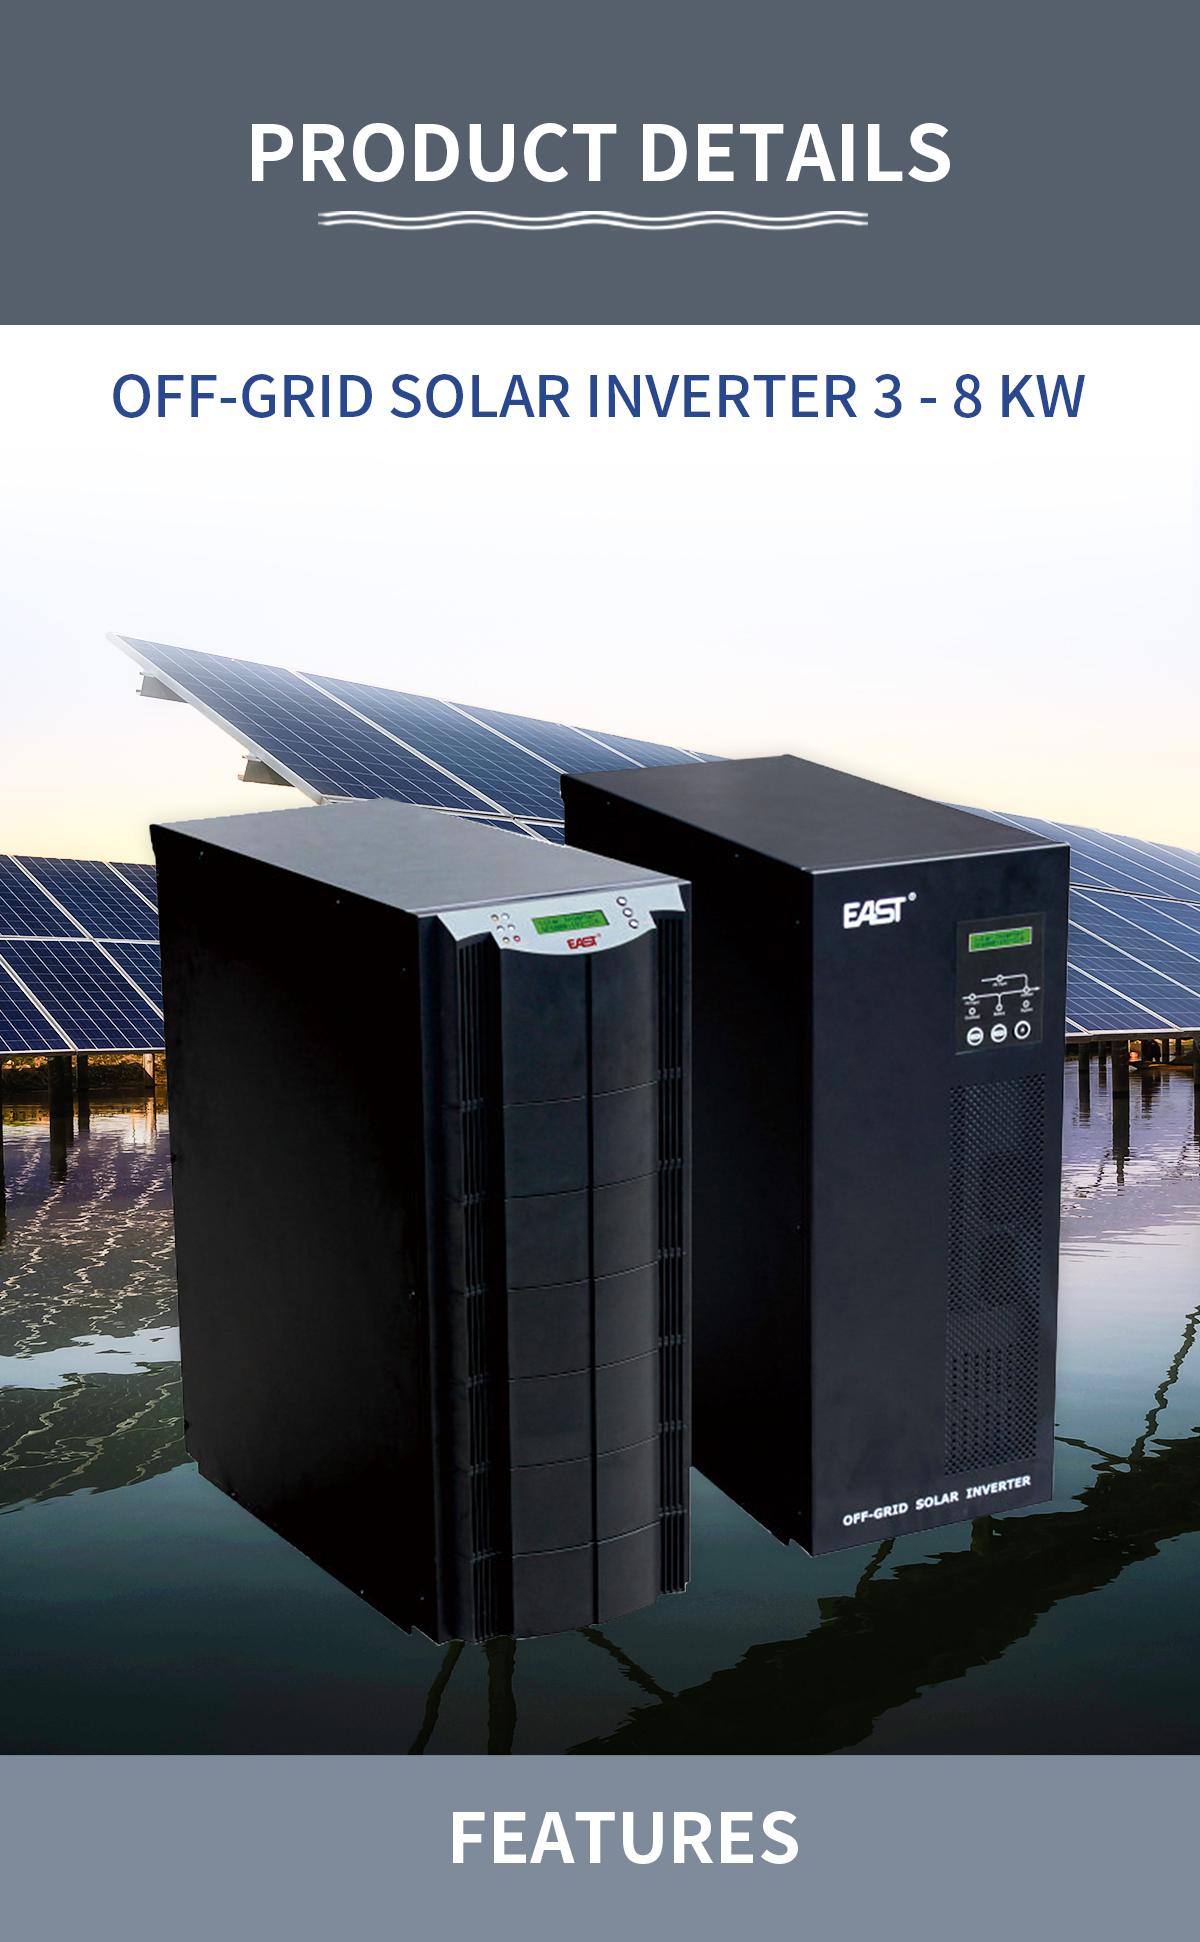 Off-Grid-Solar-Inverter-3---8-kW-(产品主图)_01.jpg